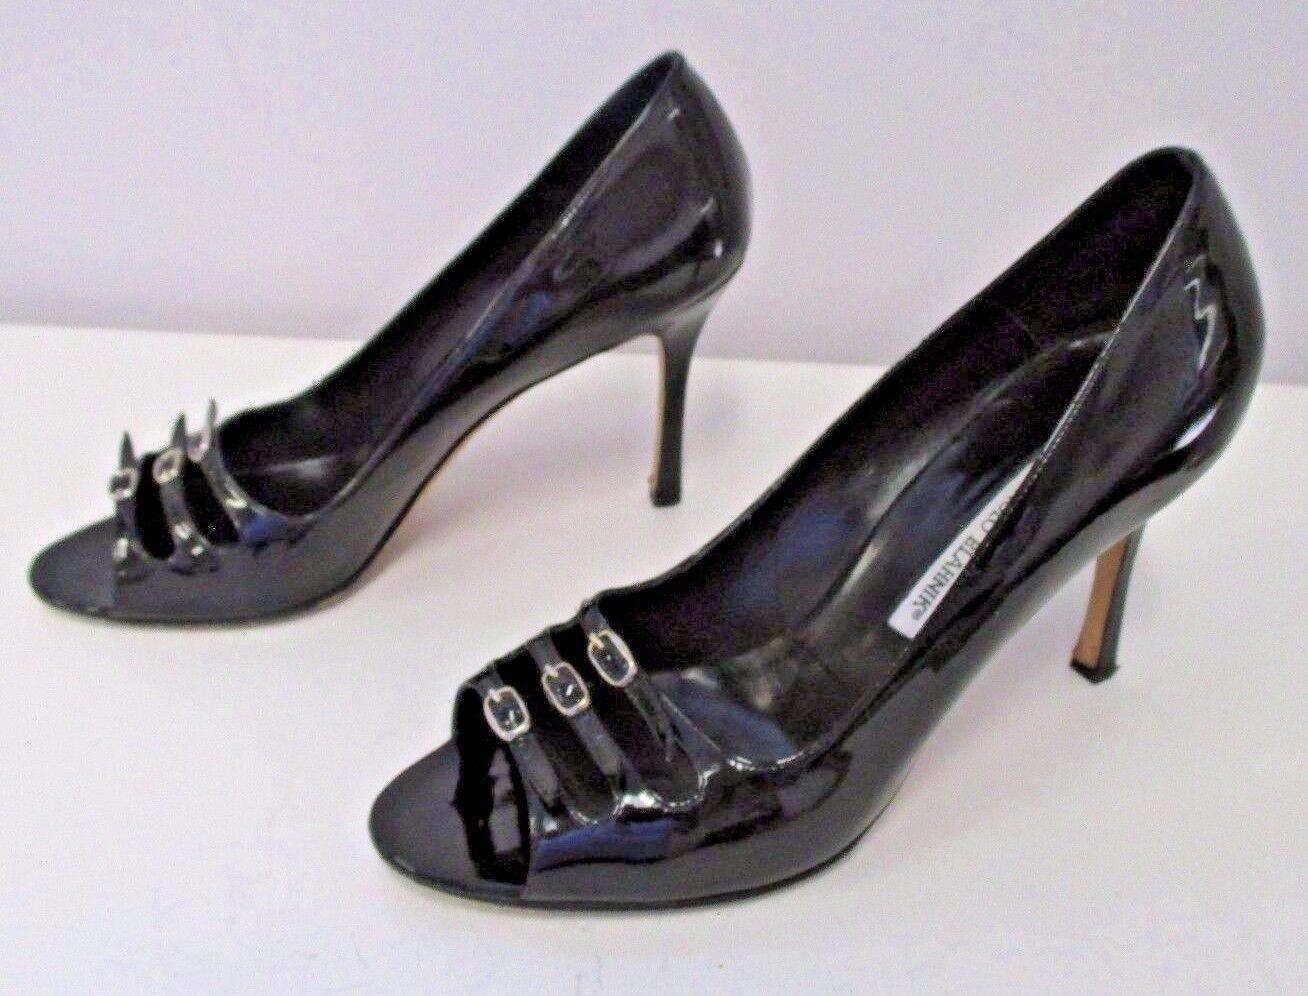 MANOLO BLAHNIK Black Patent Leather Open Toe Heels w  Three Rows of Buckles - 41